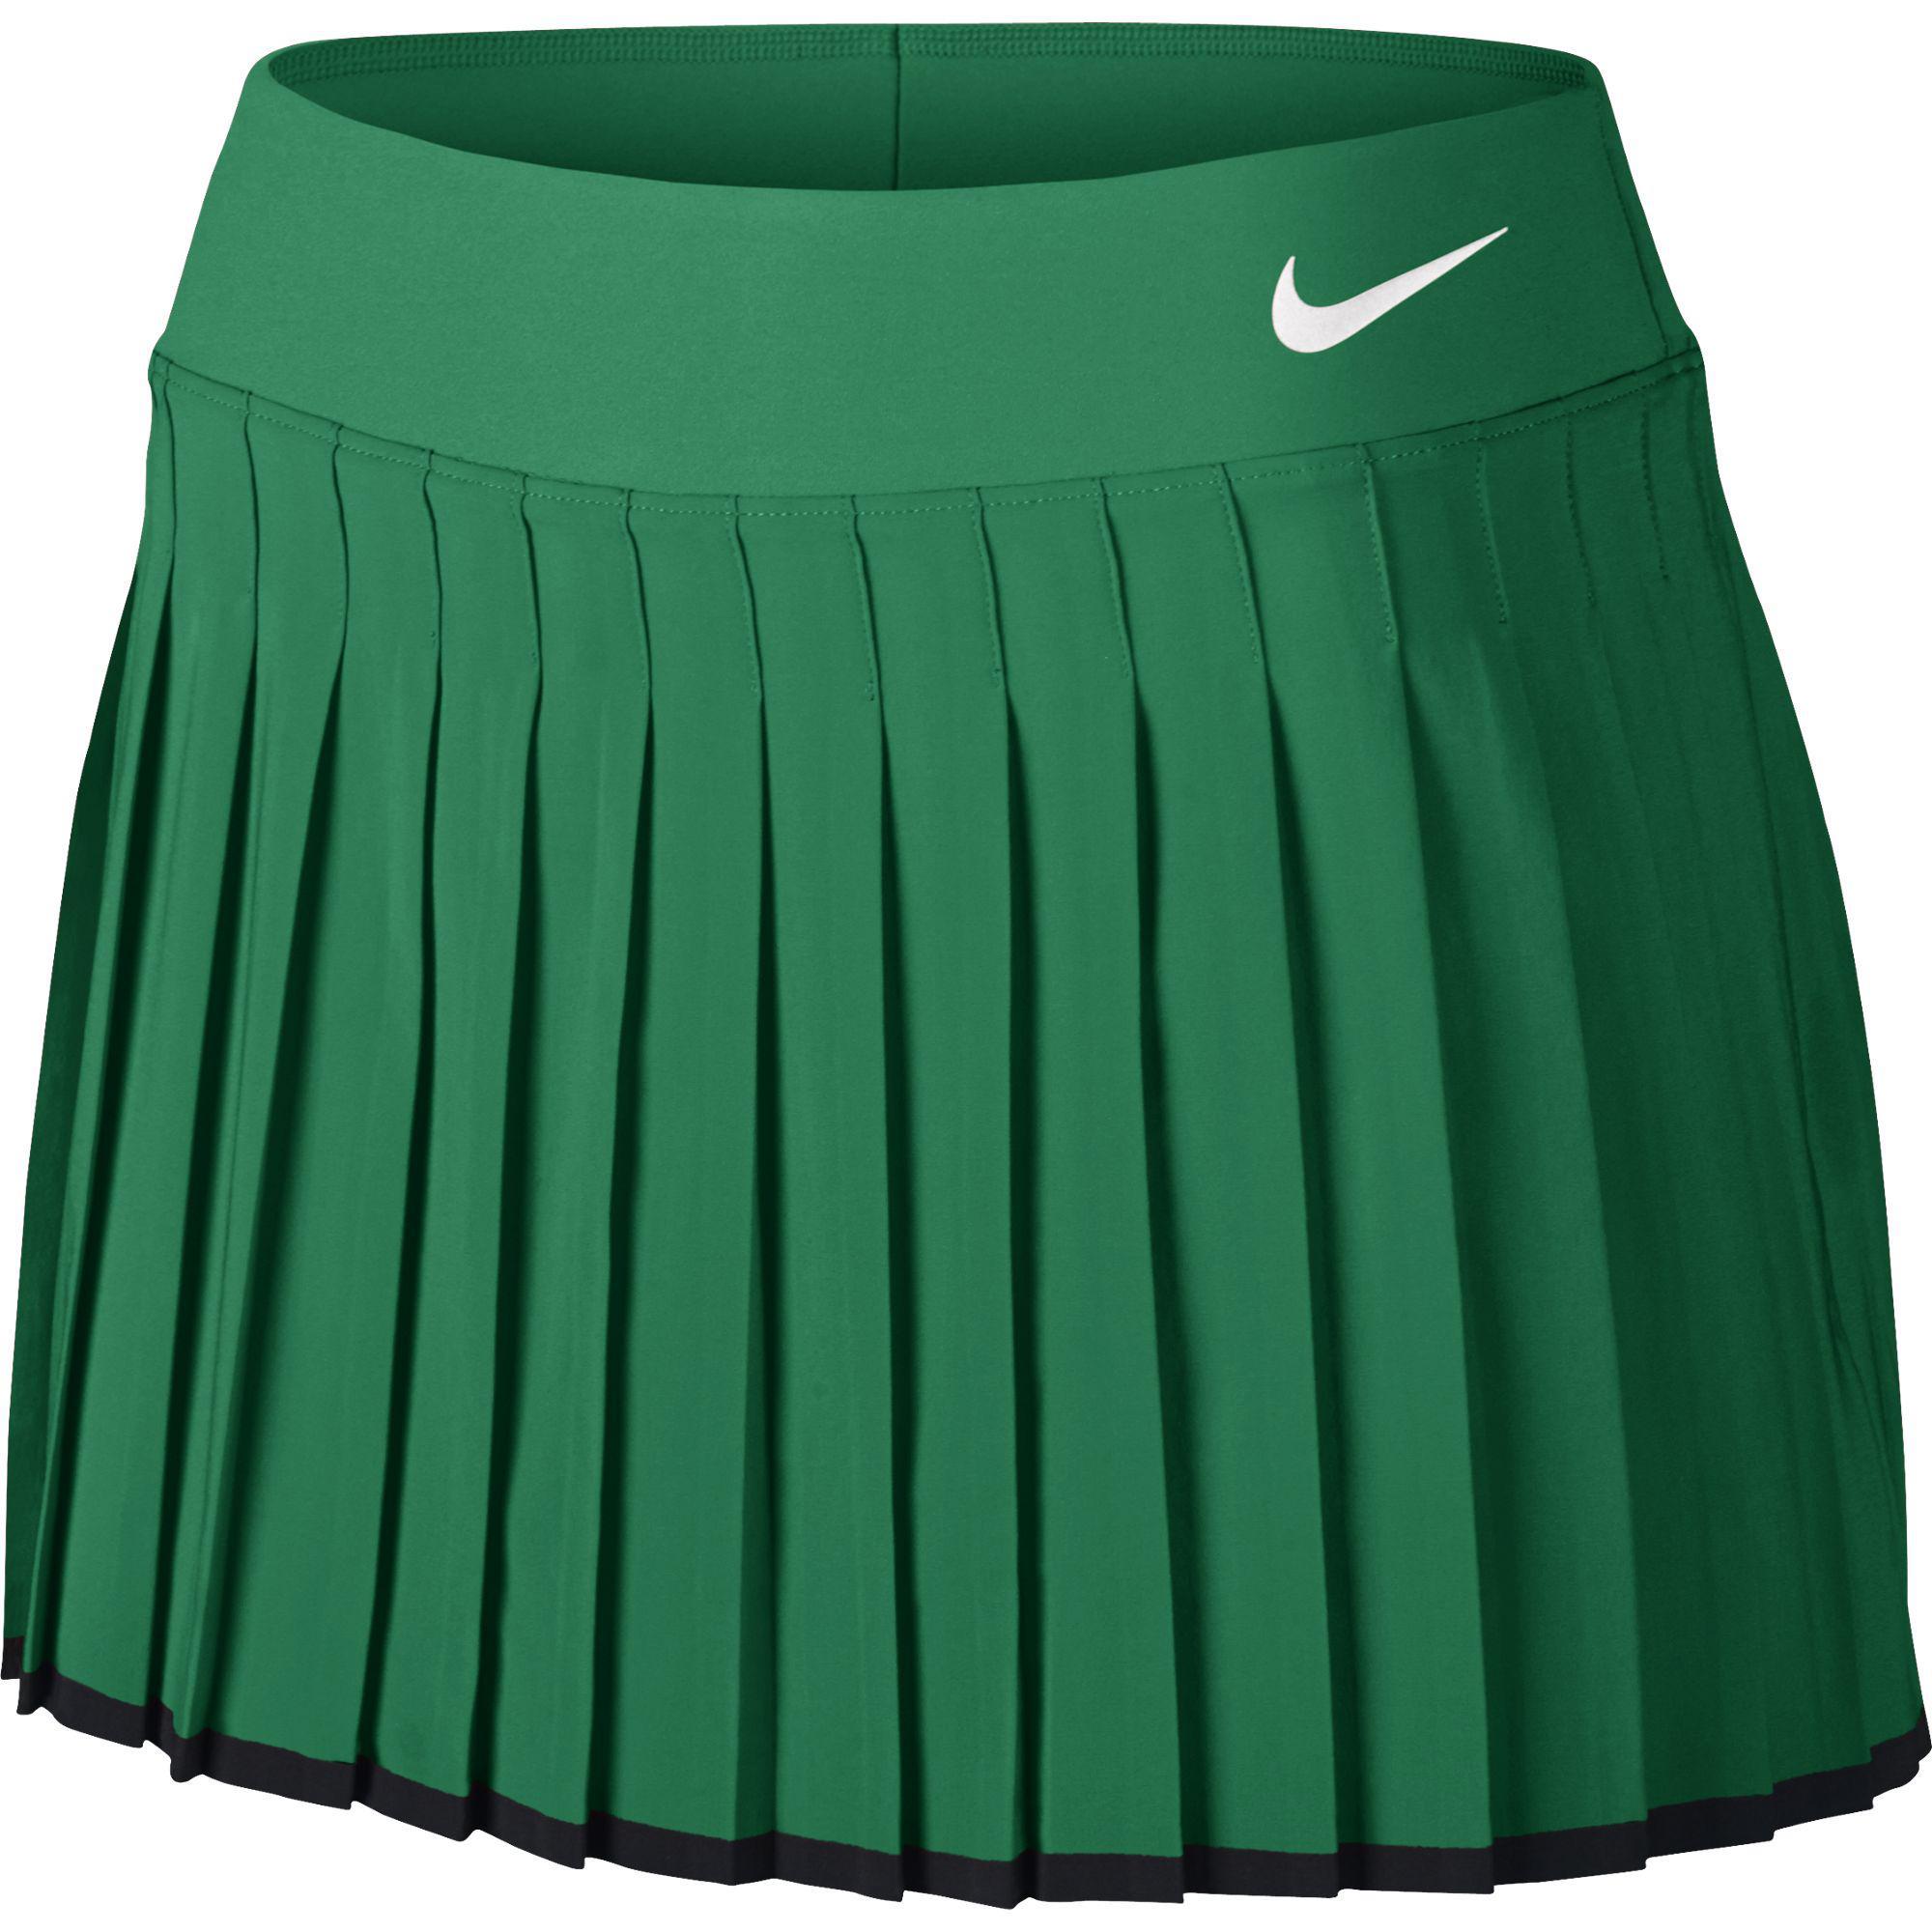 Nike Womens Victory Tennis Skort [Regular/Long] - Lucid Green/Black